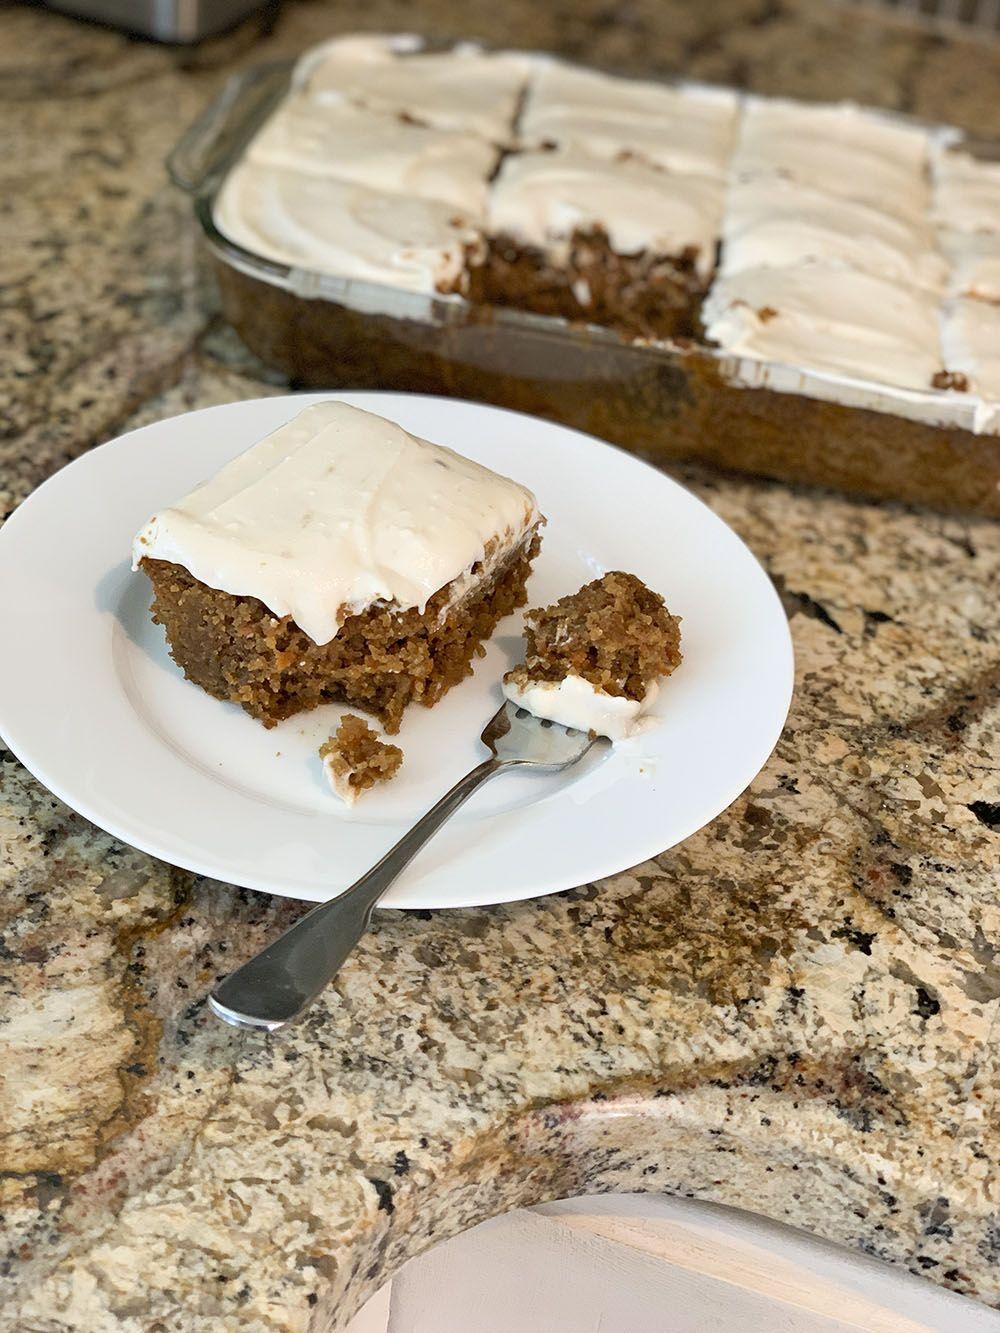 Gluten Free Pineapple Carrot Cake Carrot cake, Food